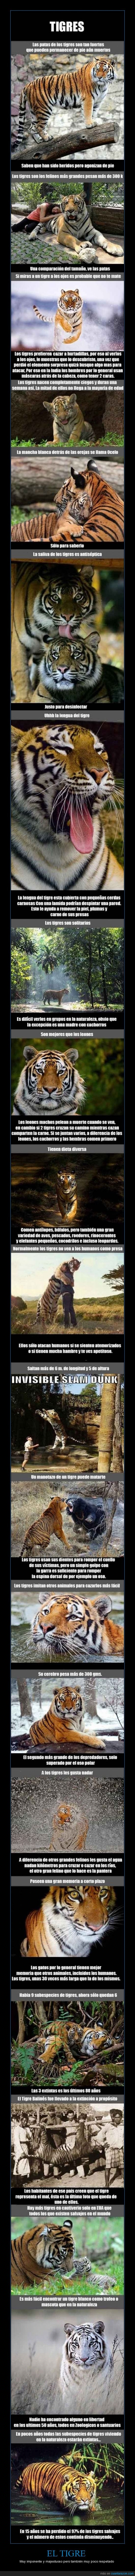 animal,extincion,imponente,naturaleza,tigre